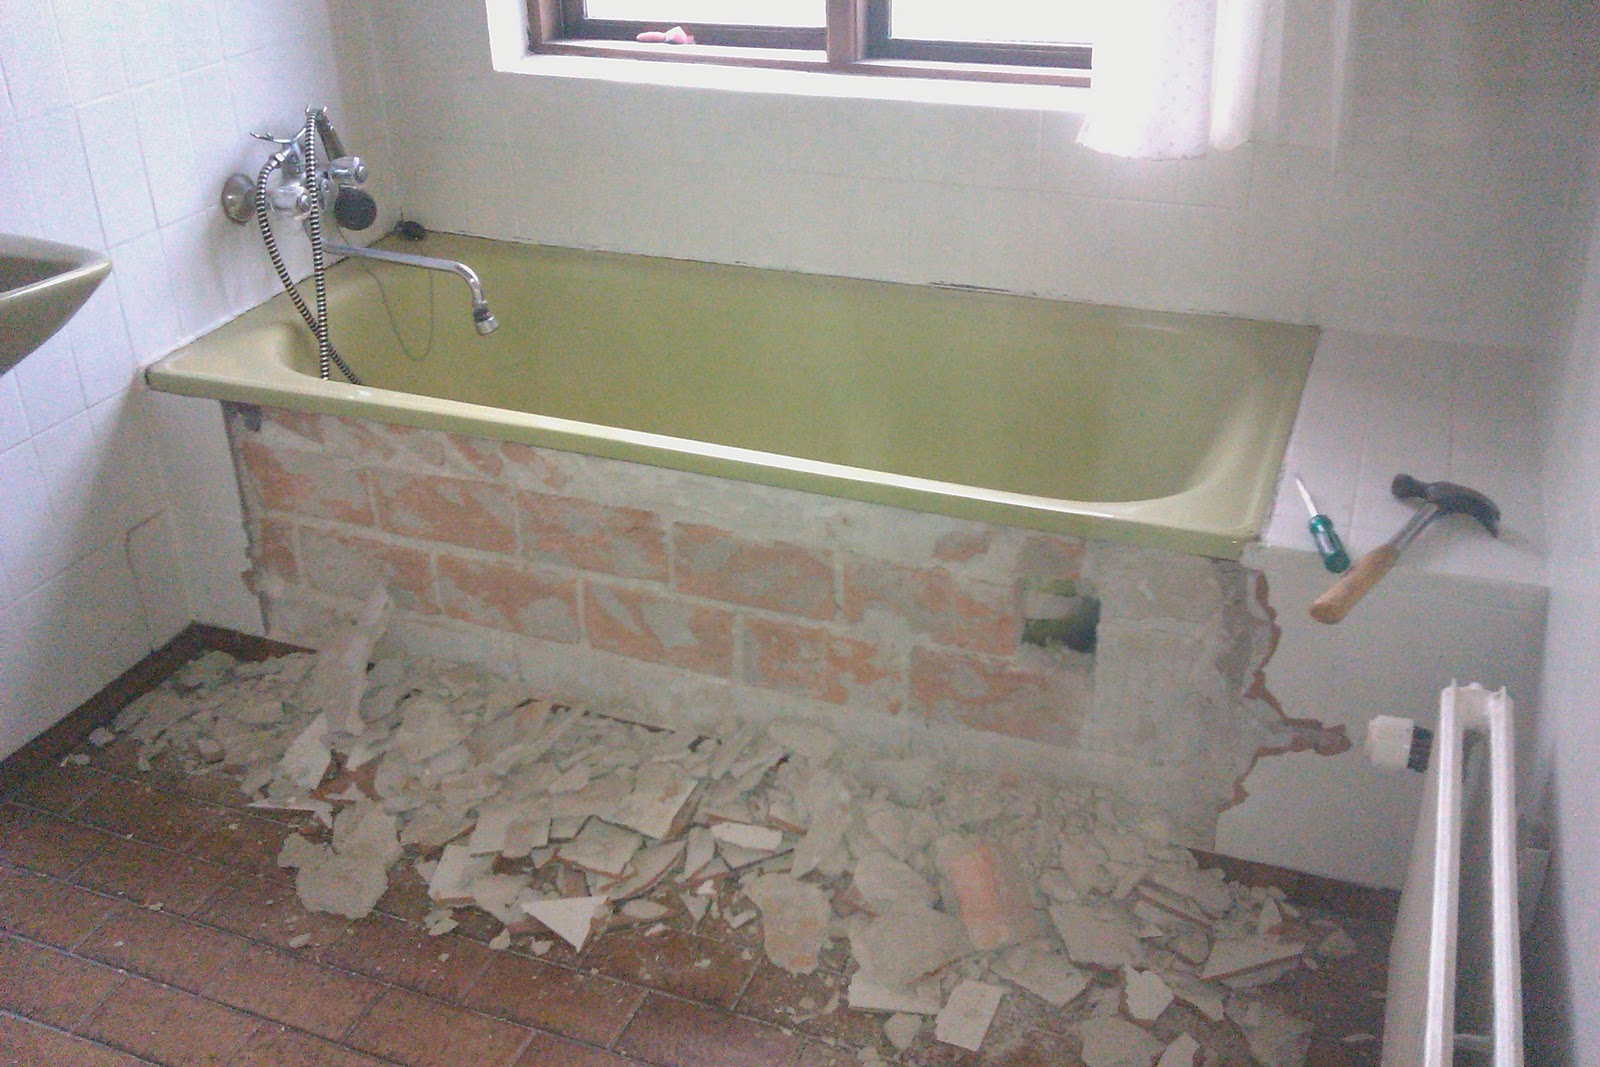 fliser badeværelse gulv hallie handywoman: Badeværelsesgulv brækkes op fliser badeværelse gulv